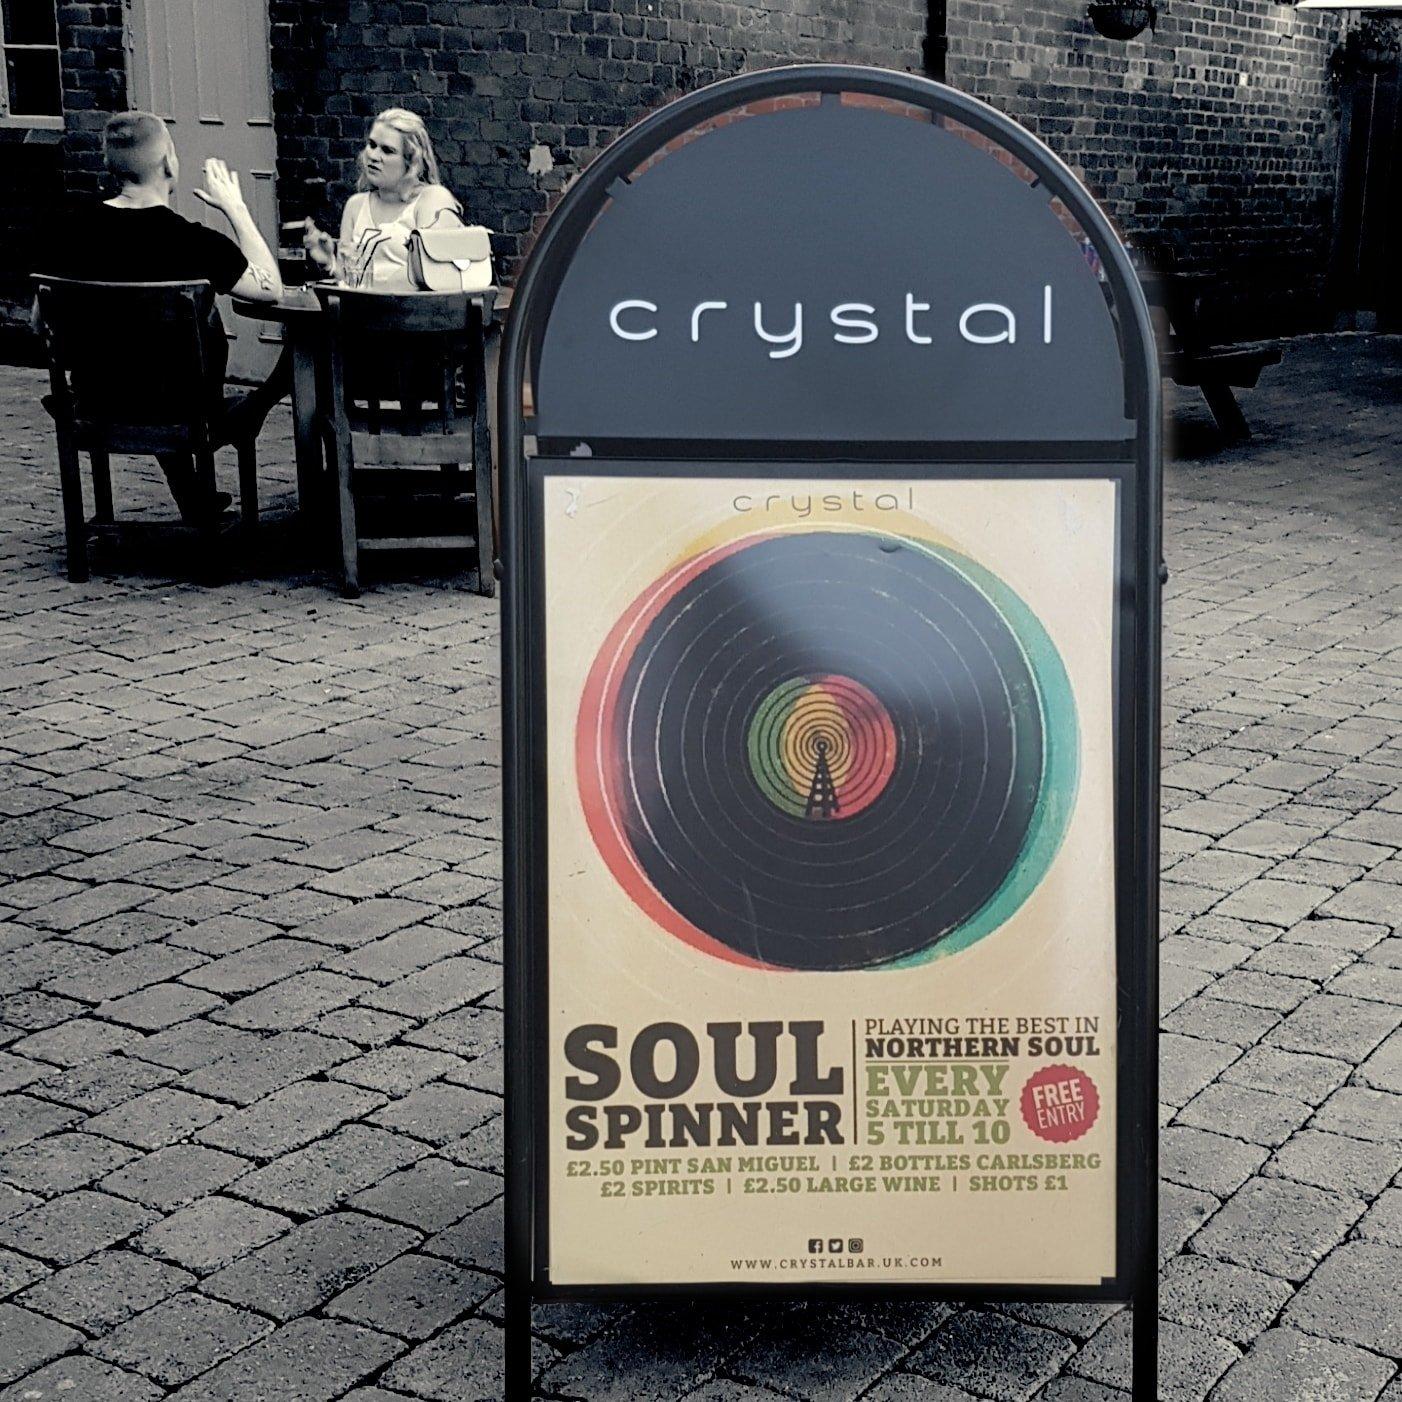 Soul Spinner Saturday  Crystal  Carver Street Sheffield flyer